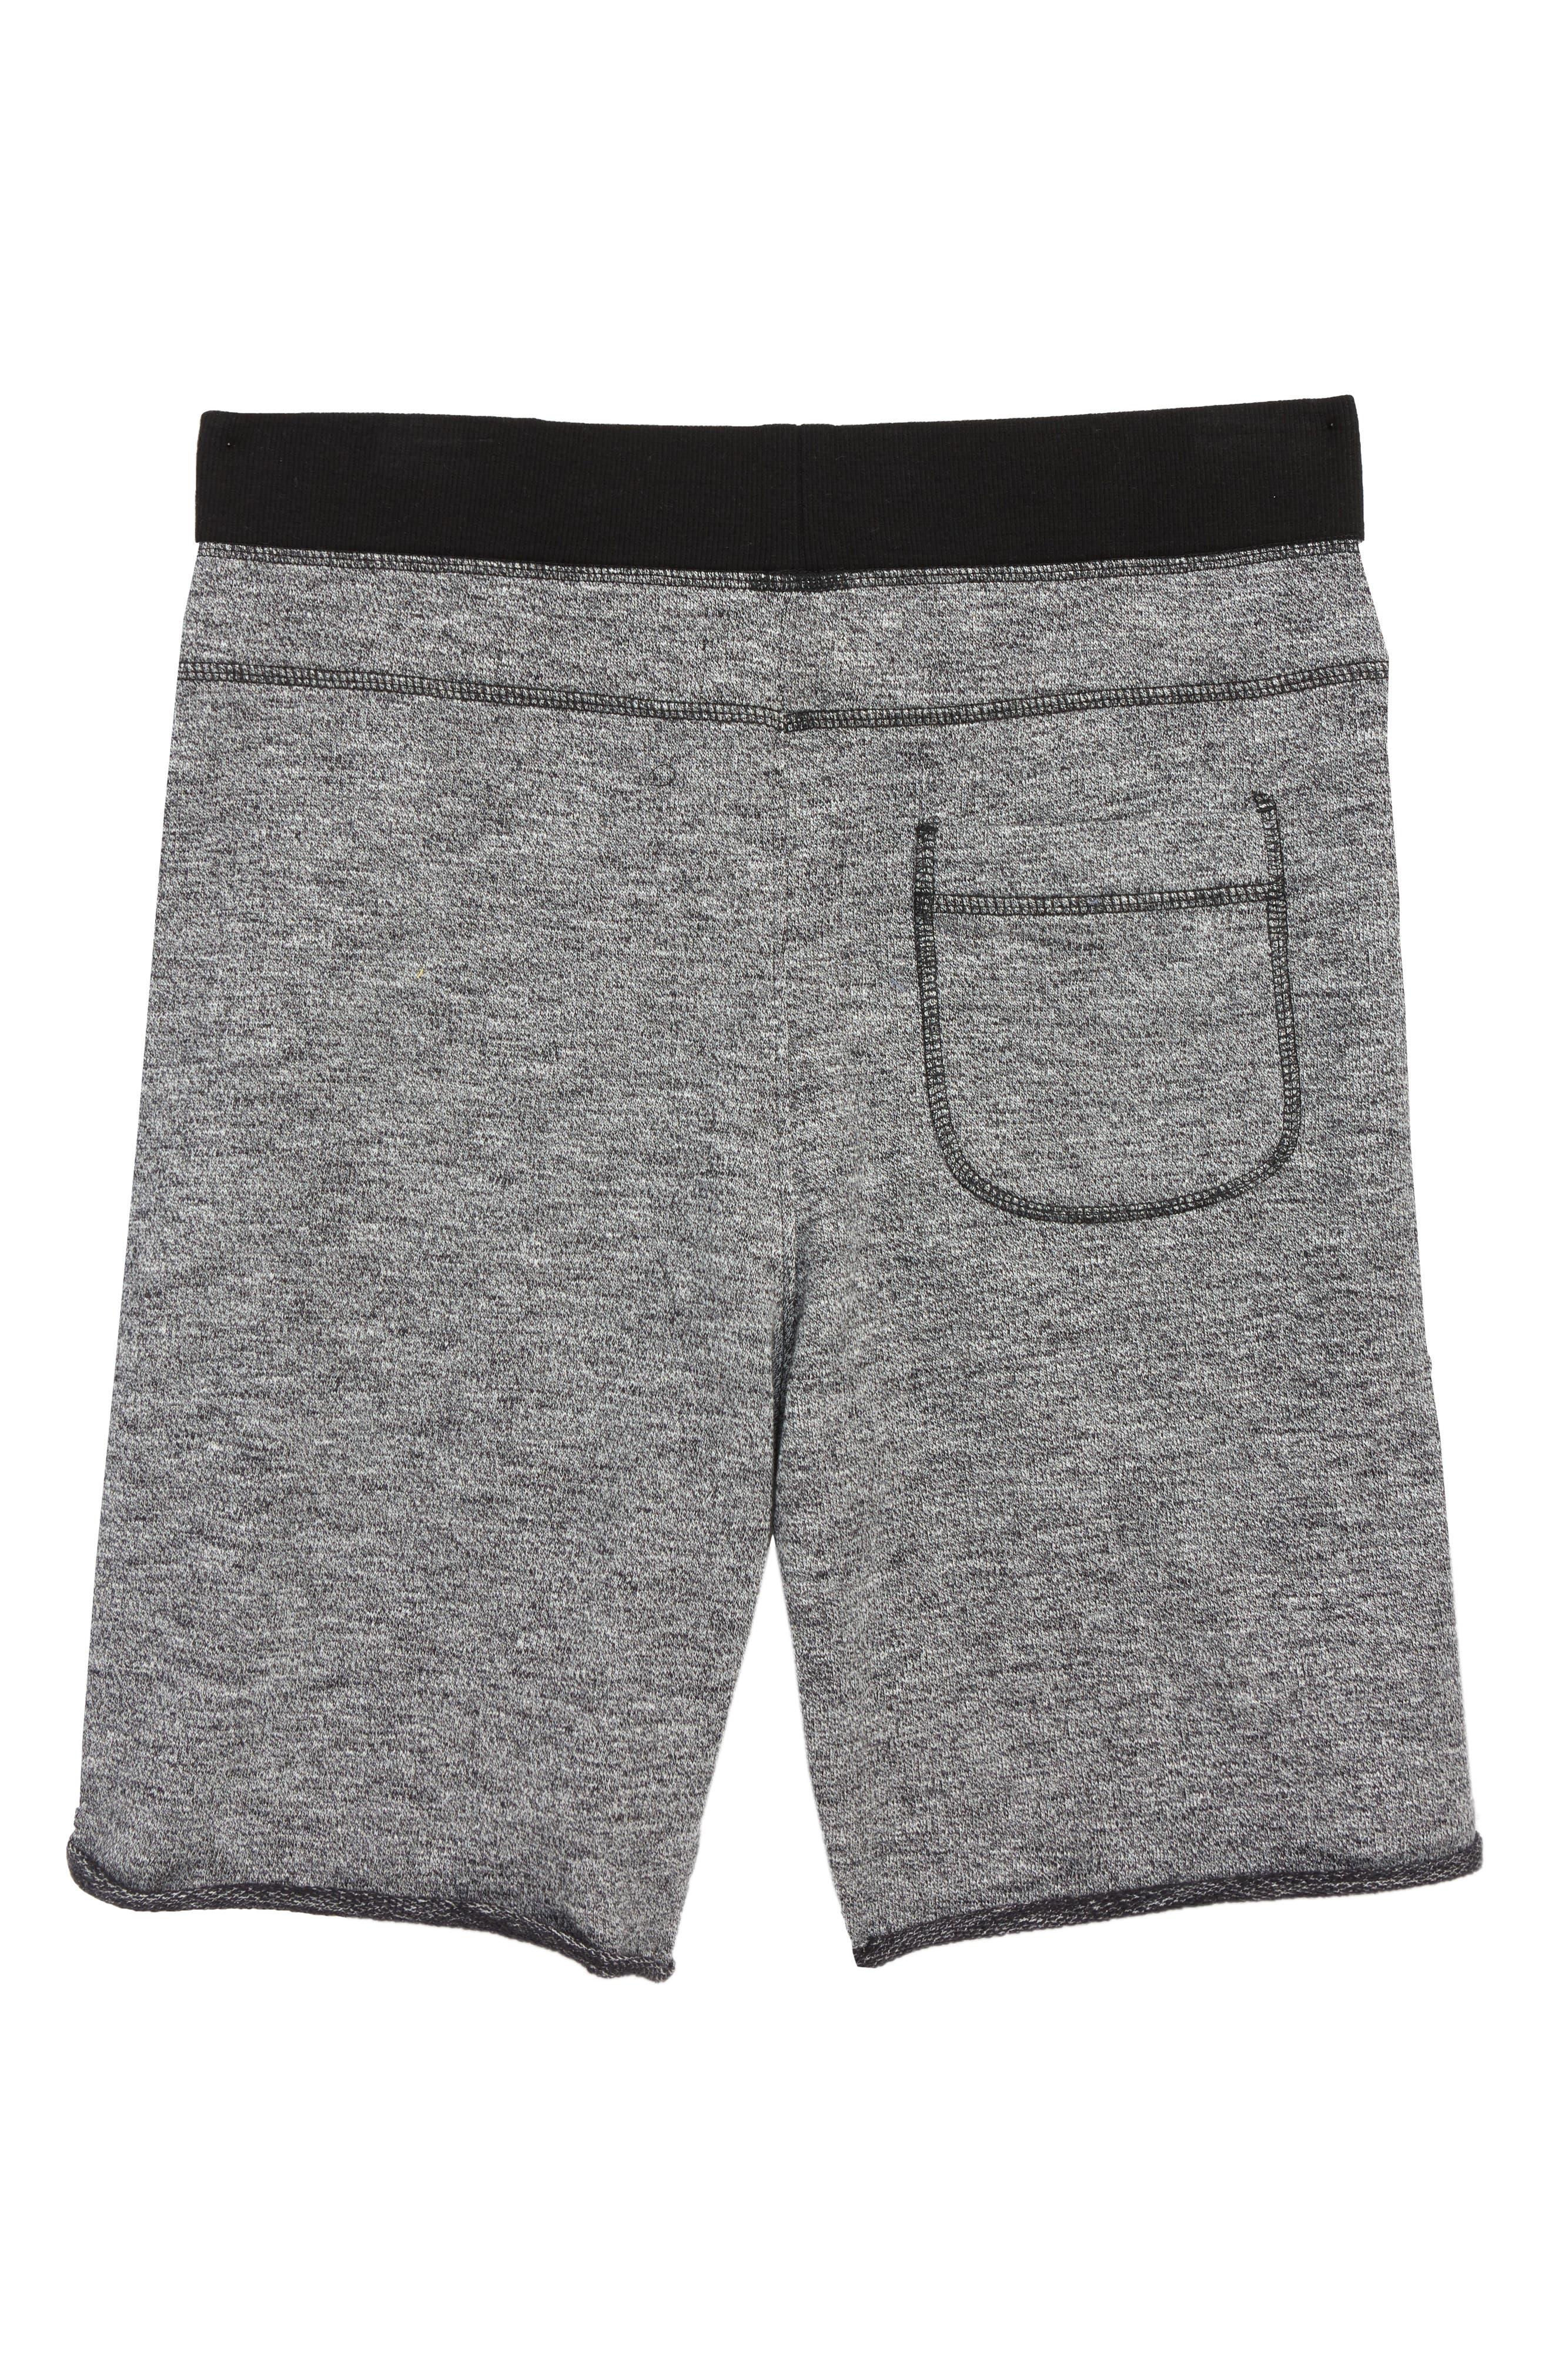 Fleece Knit Shorts,                             Alternate thumbnail 2, color,                             030